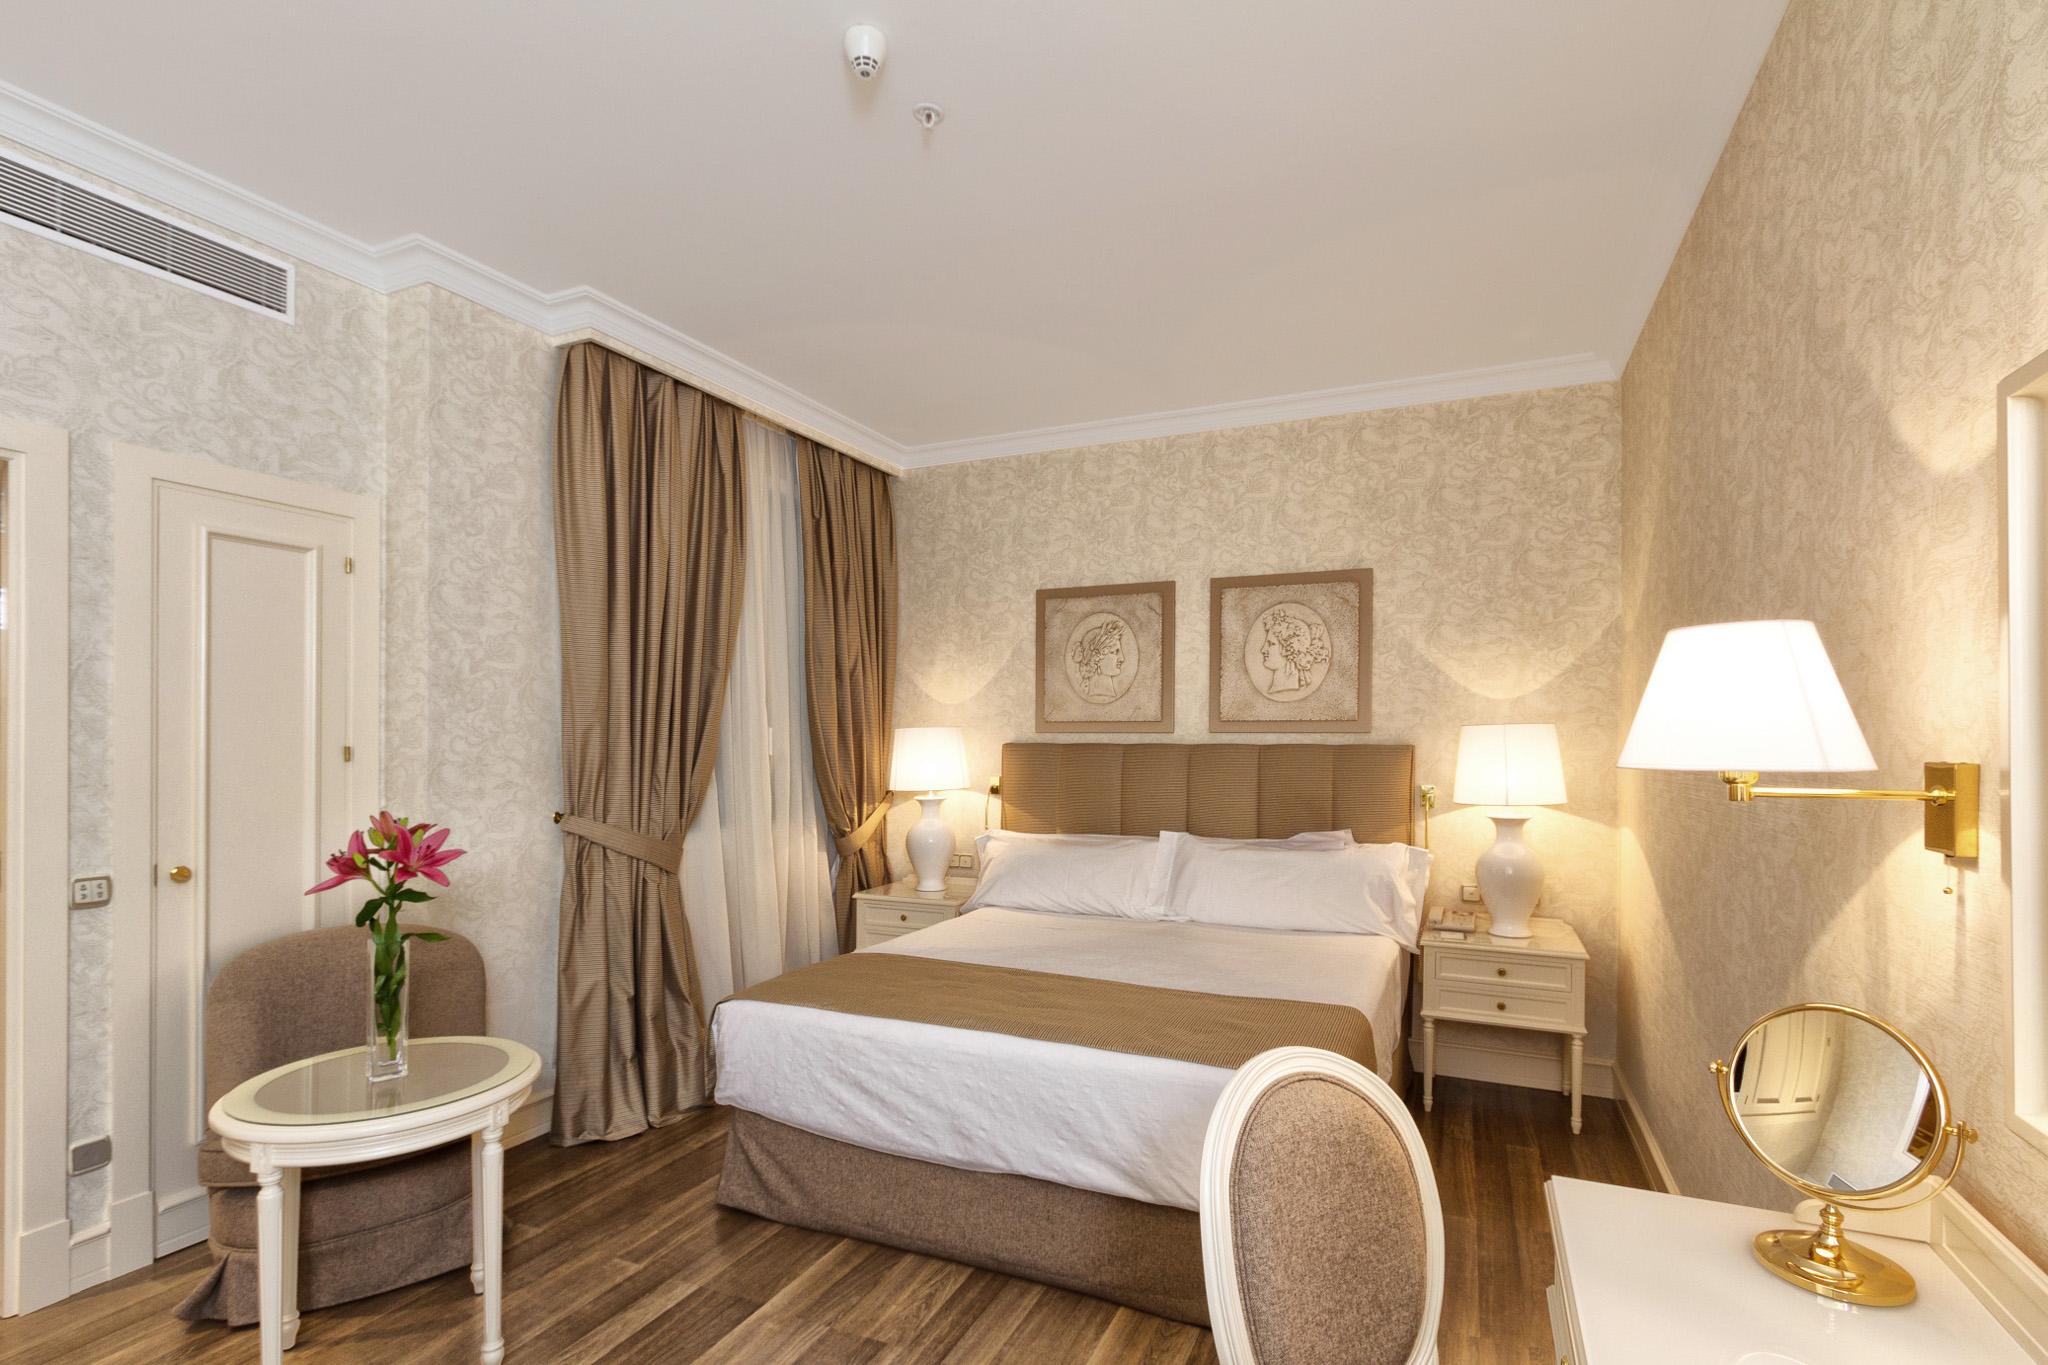 Luxury Hotel in Madrid center - 4 star Hotel Atlantico Madrid